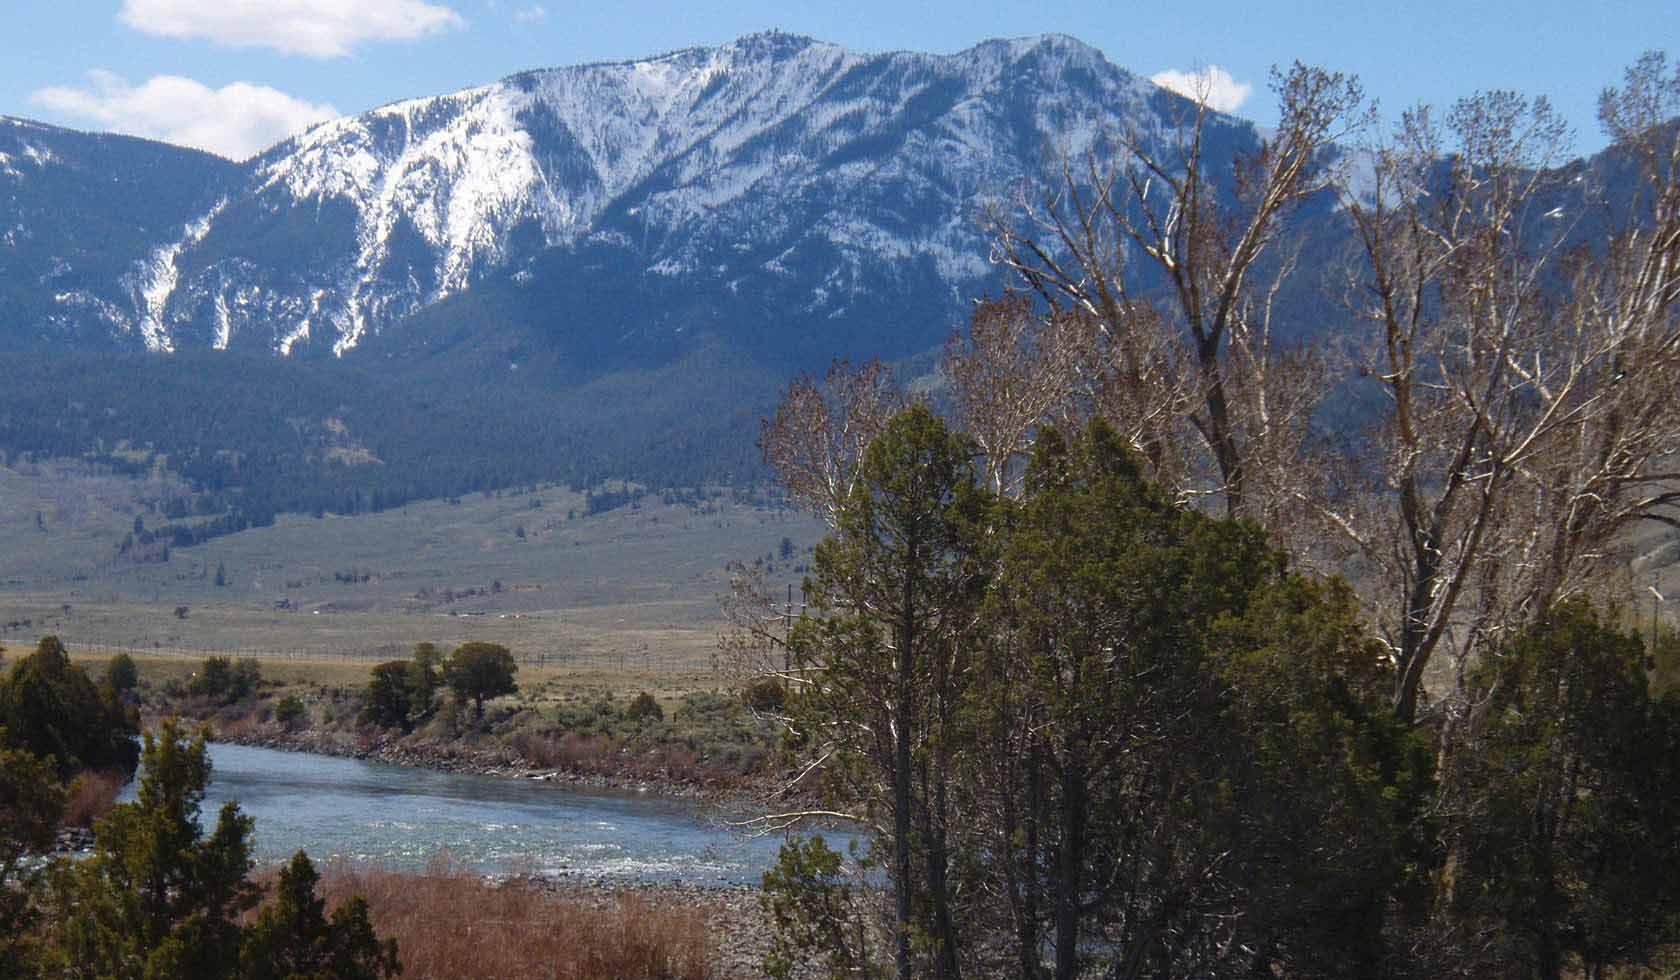 A Yellowstone Riverbend Cabin profile image